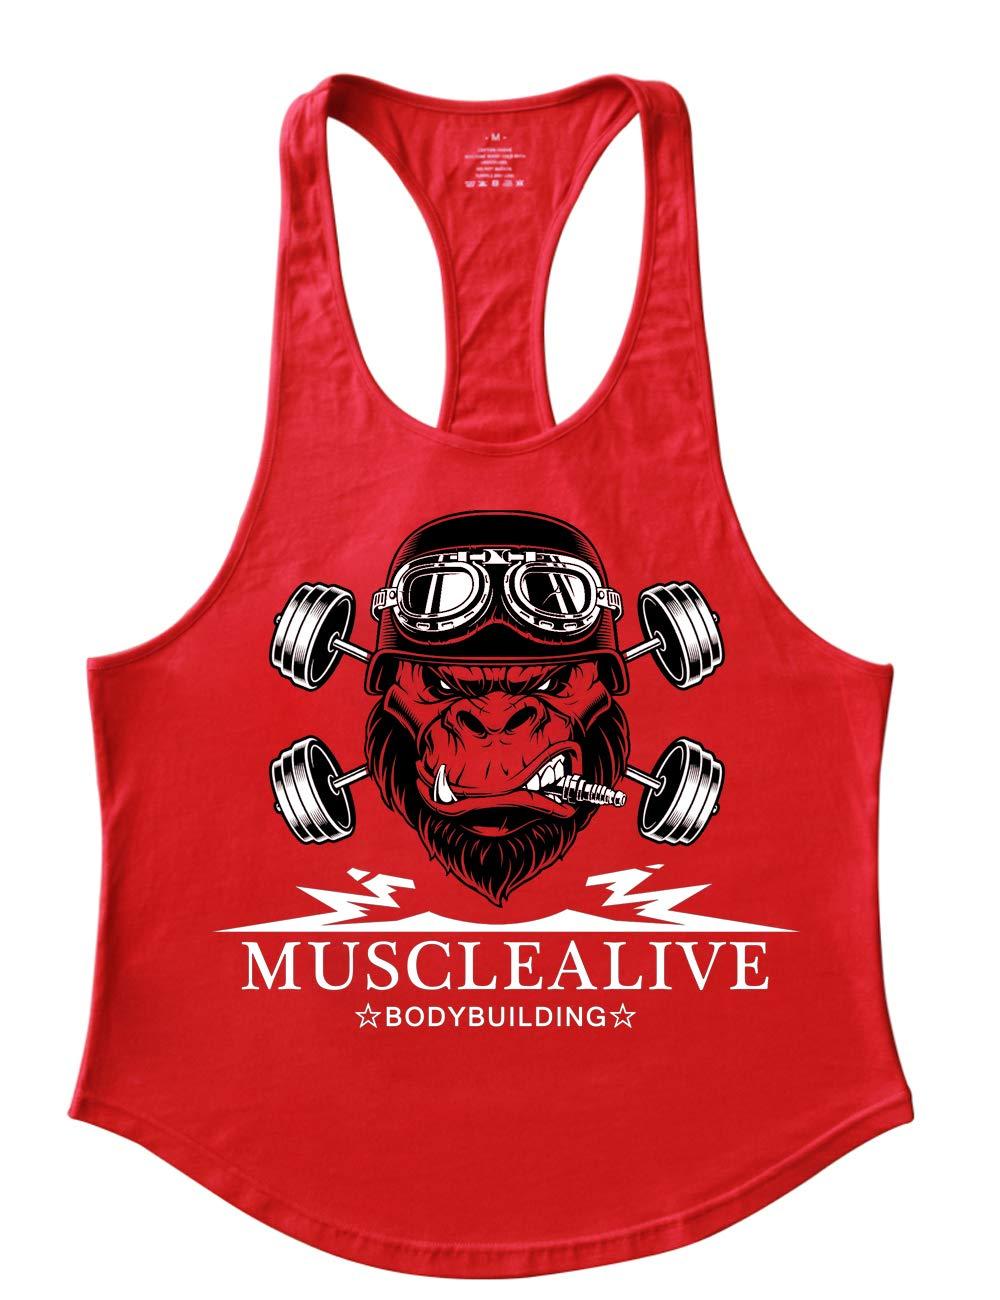 GYMAPE Mens Stringer Gym Bodybuilding Tank Tops Cotton for Workout with Arch Hem